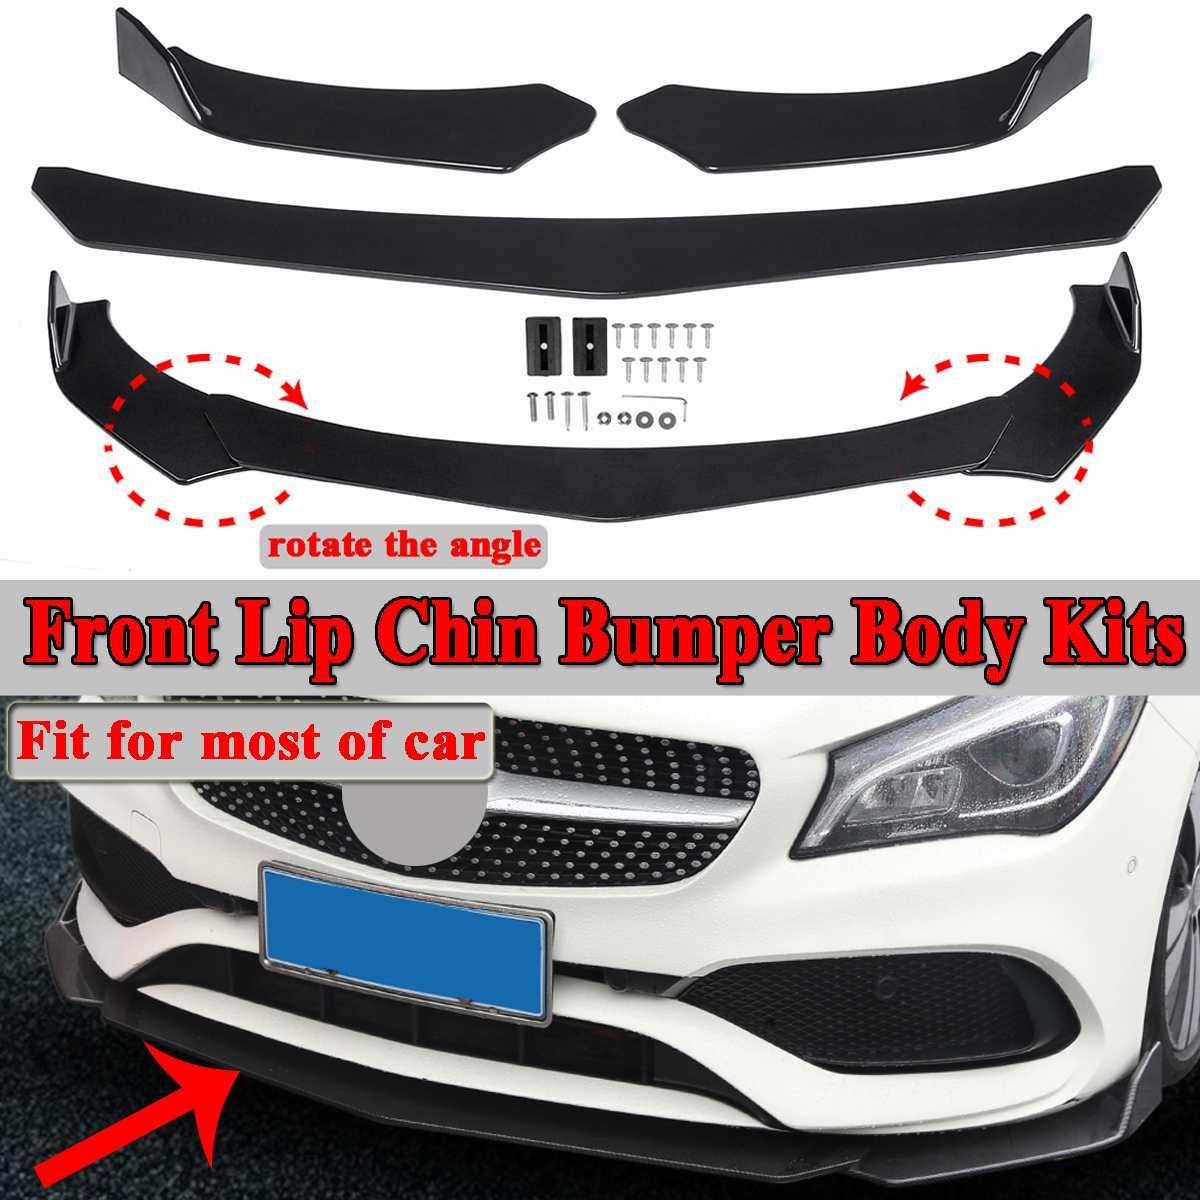 3pc שחור אוניברסלי רכב מגן קדמי שפתיים פגוש ספליטר מפזר הגנה סנפירי גוף ספוילר ערכות עבור פורד לנץ עבור BMW